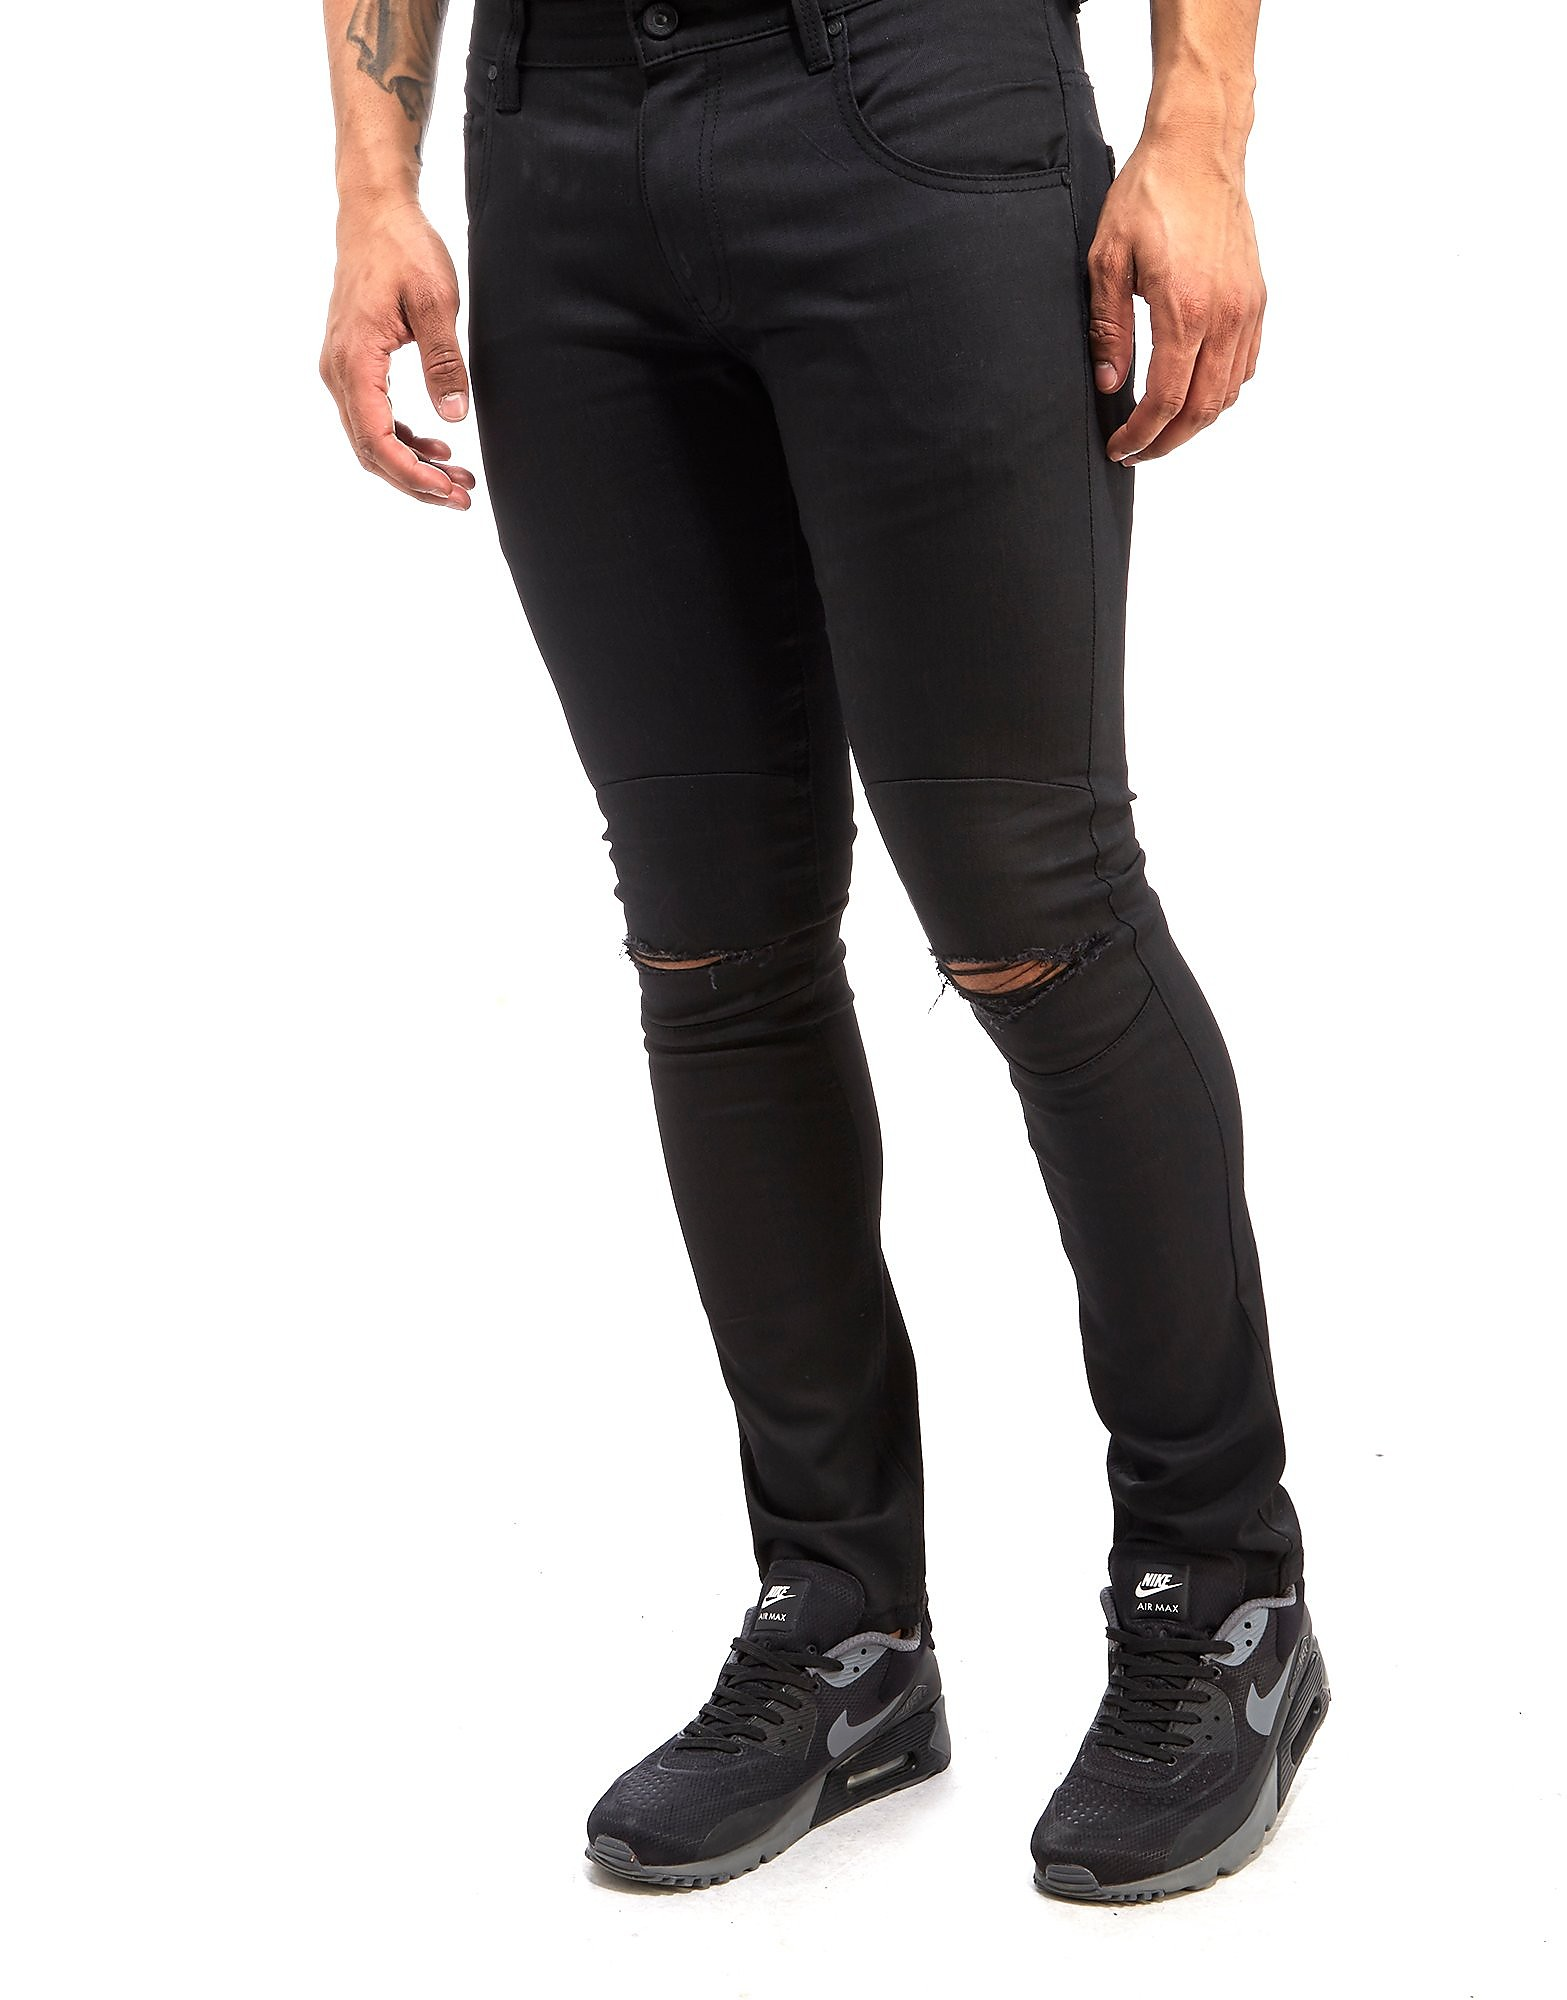 Supply & Demand Brookyln Rip Jeans